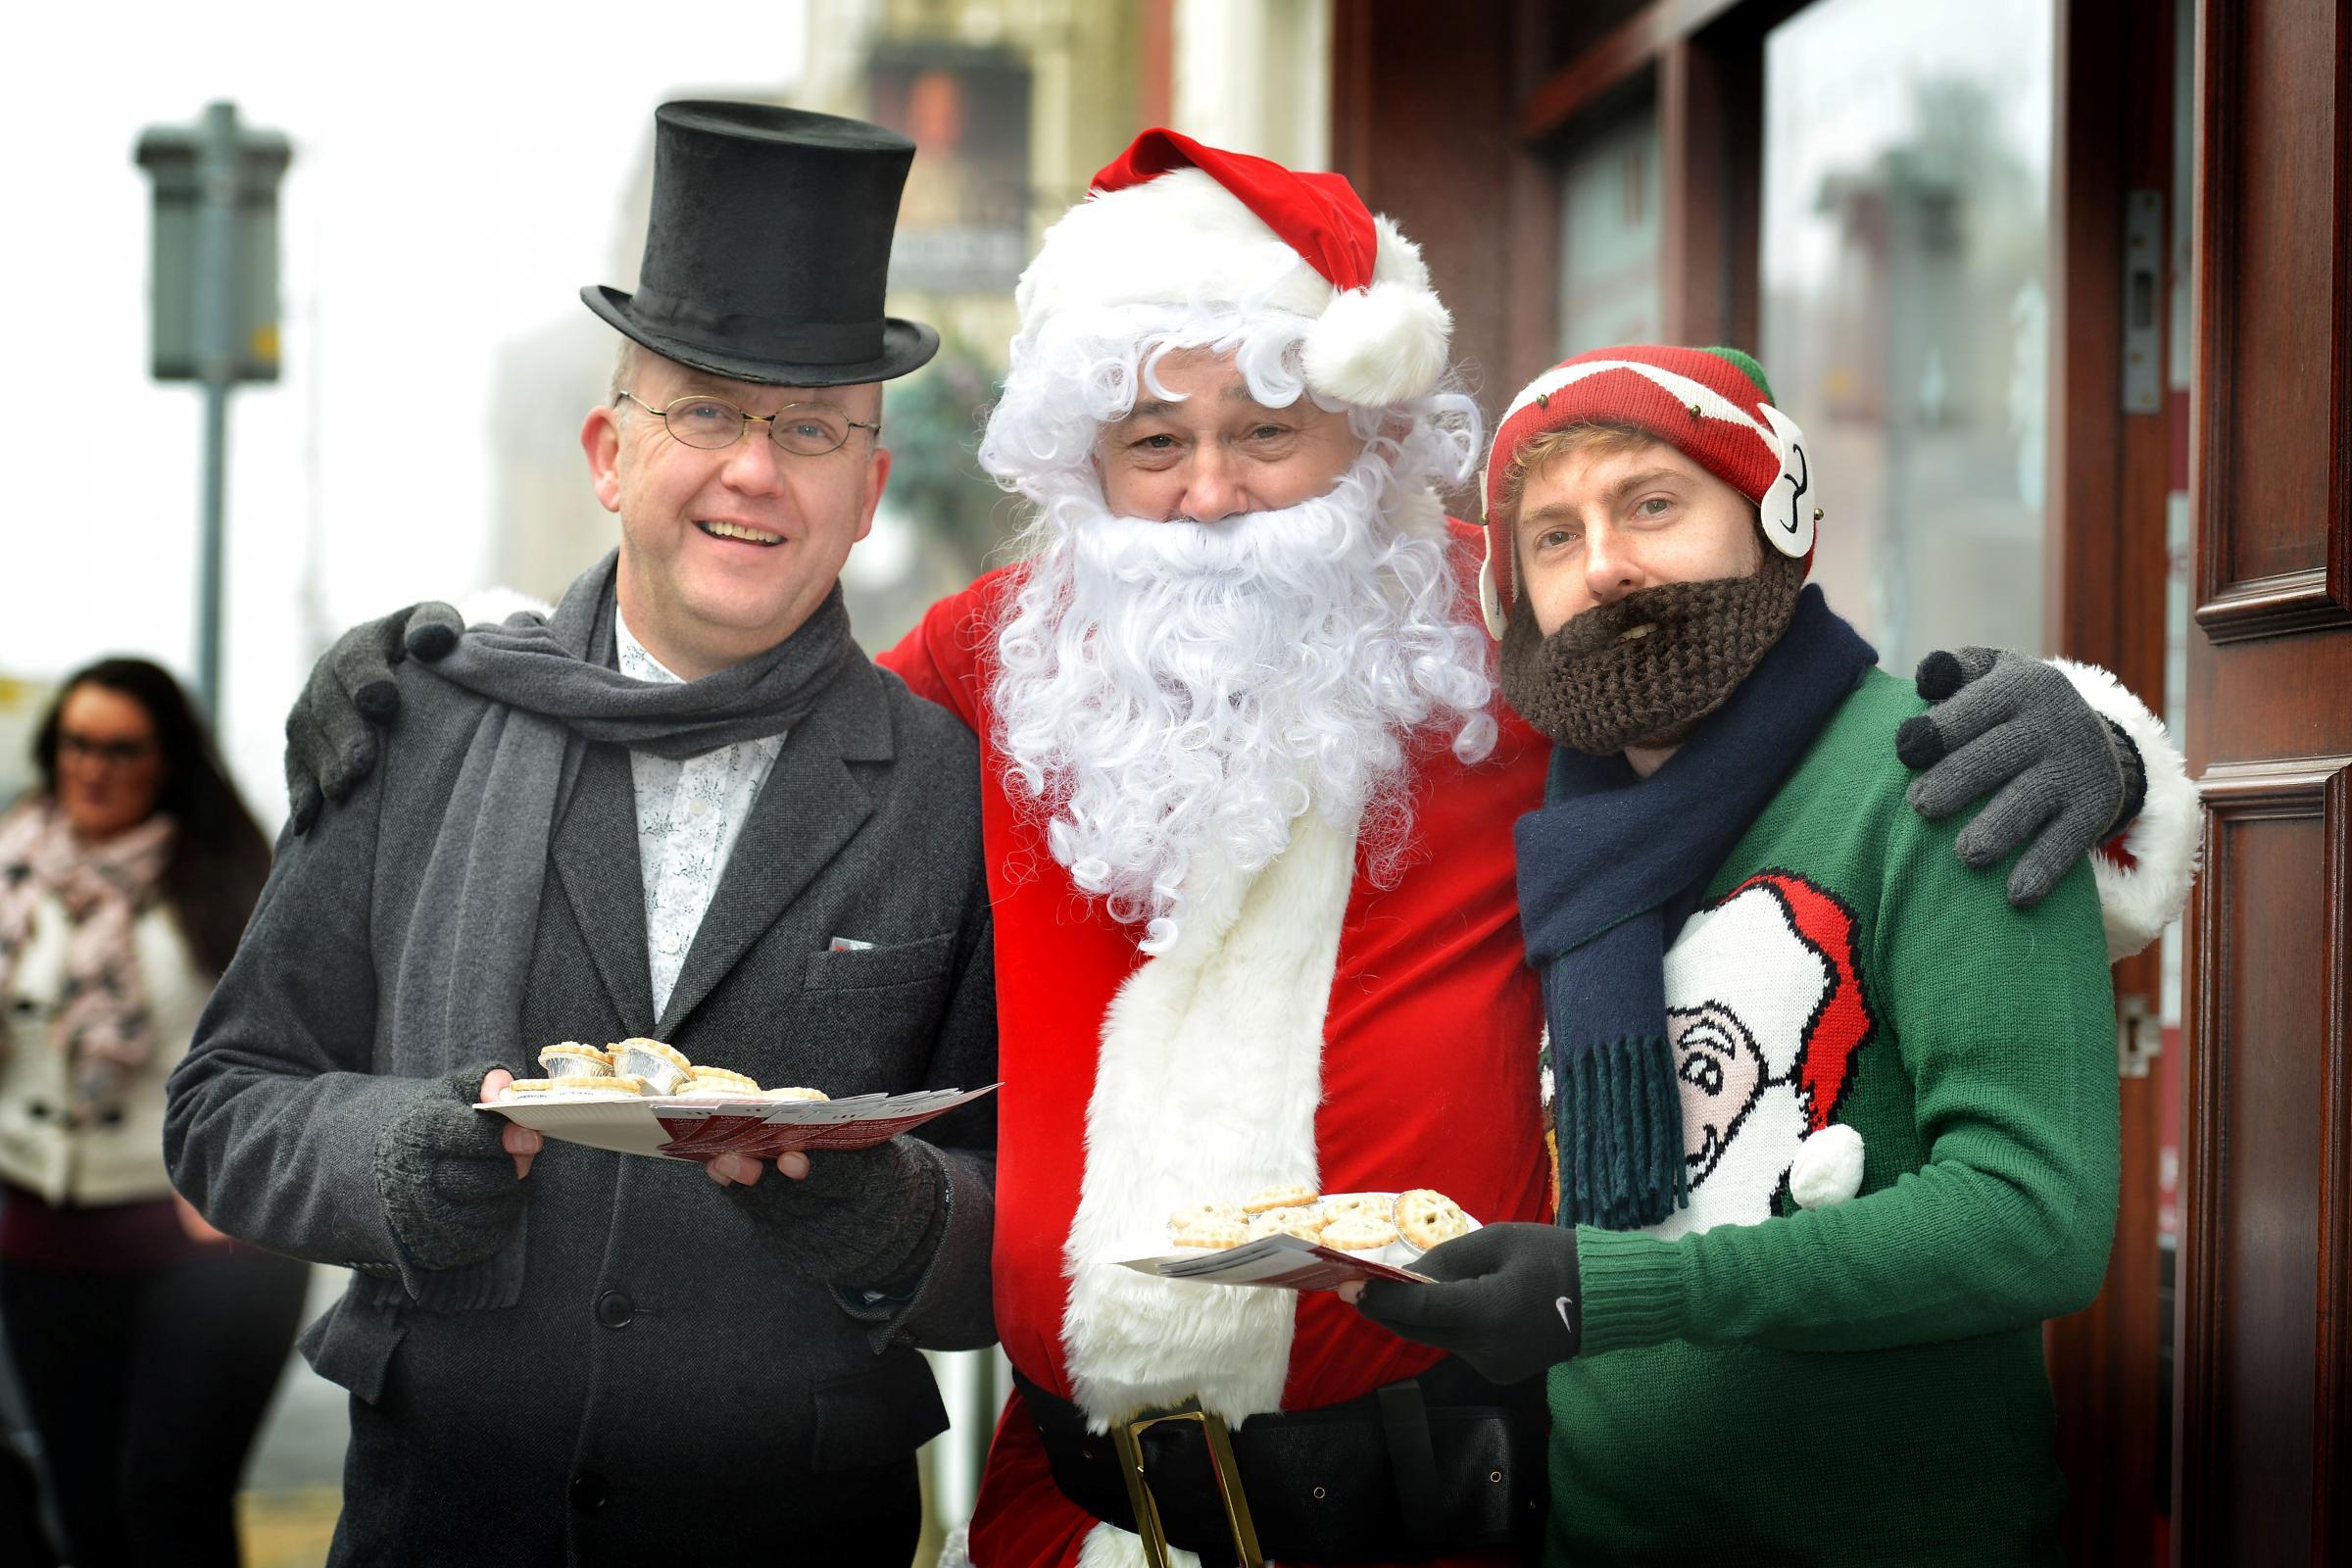 Brighouse prepares for Christmas celebrations